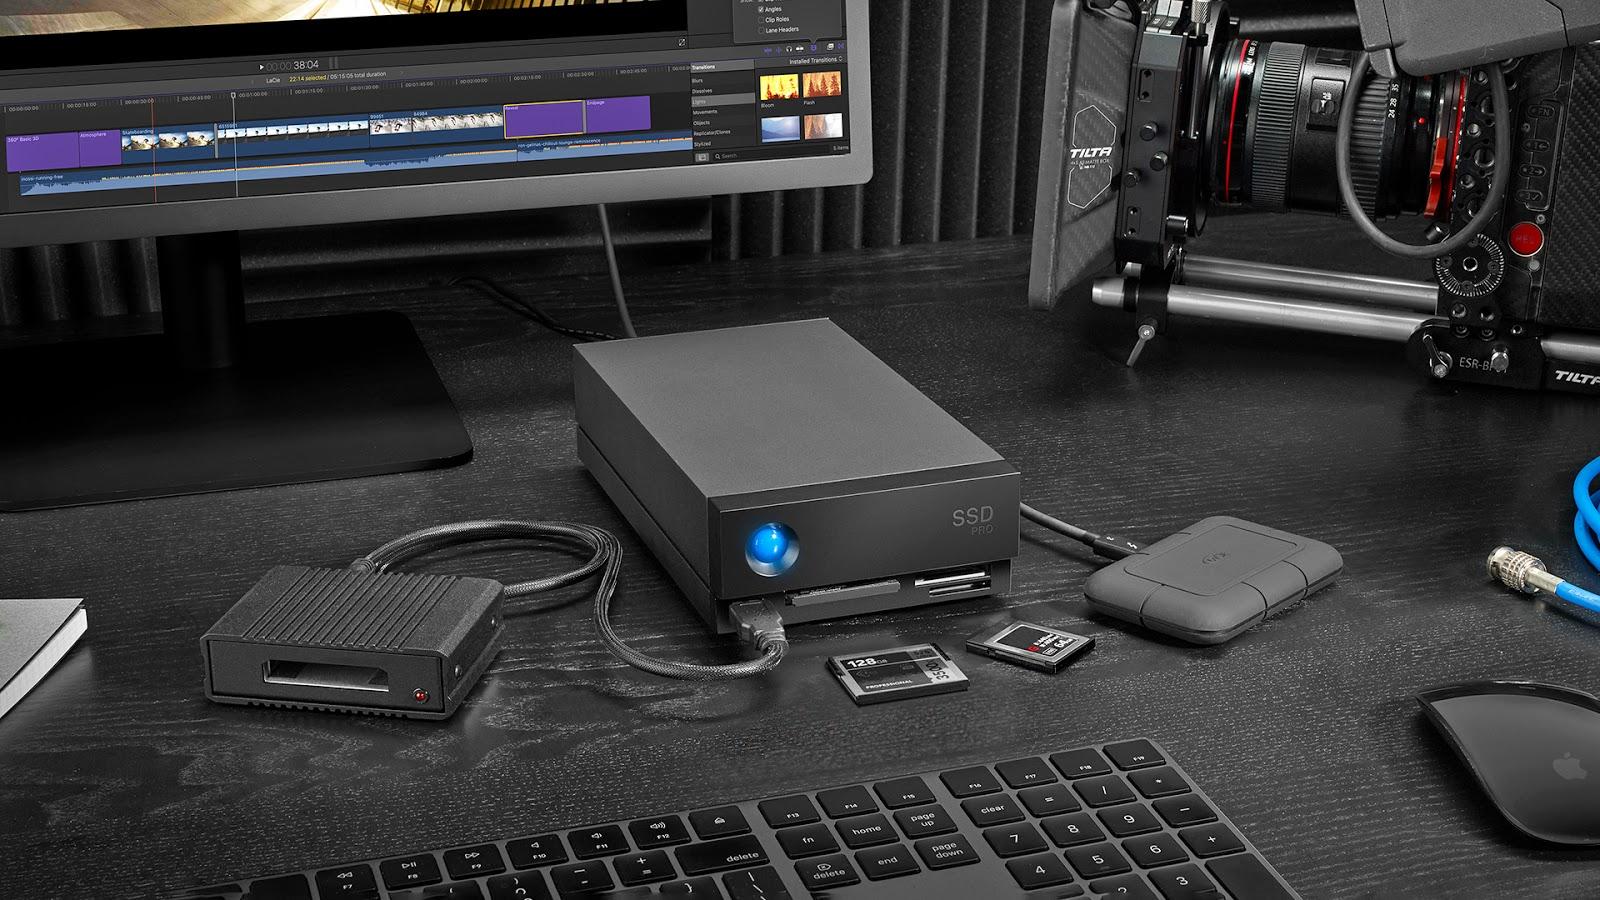 The LaCie 1big Dock SSD. Image: LaCie.